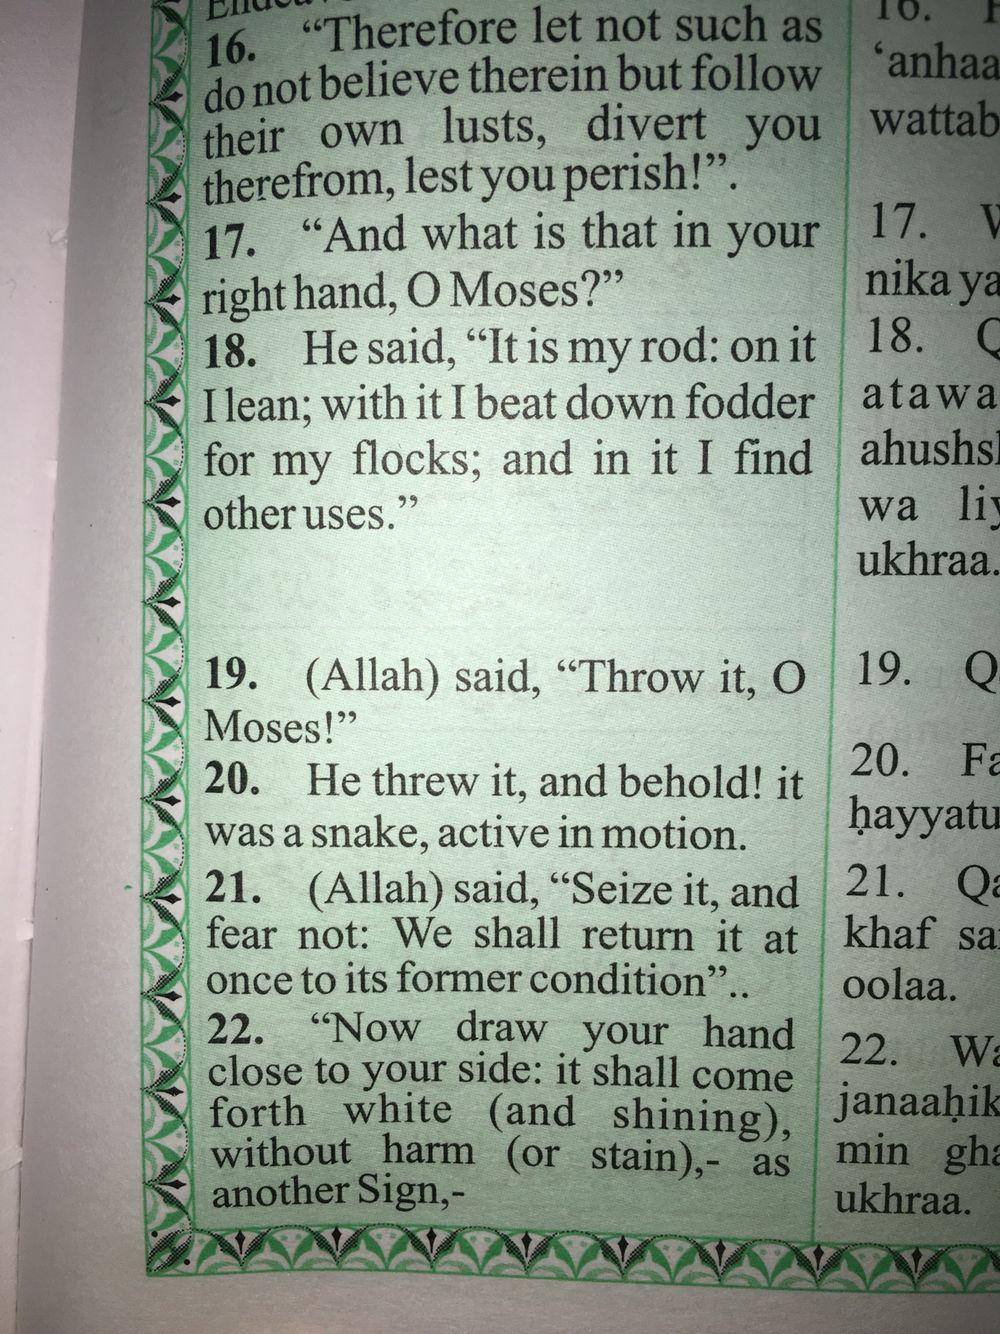 The Holy Quran- Chapter 20- Surah Taha - Al-Qur'an al-Kareem